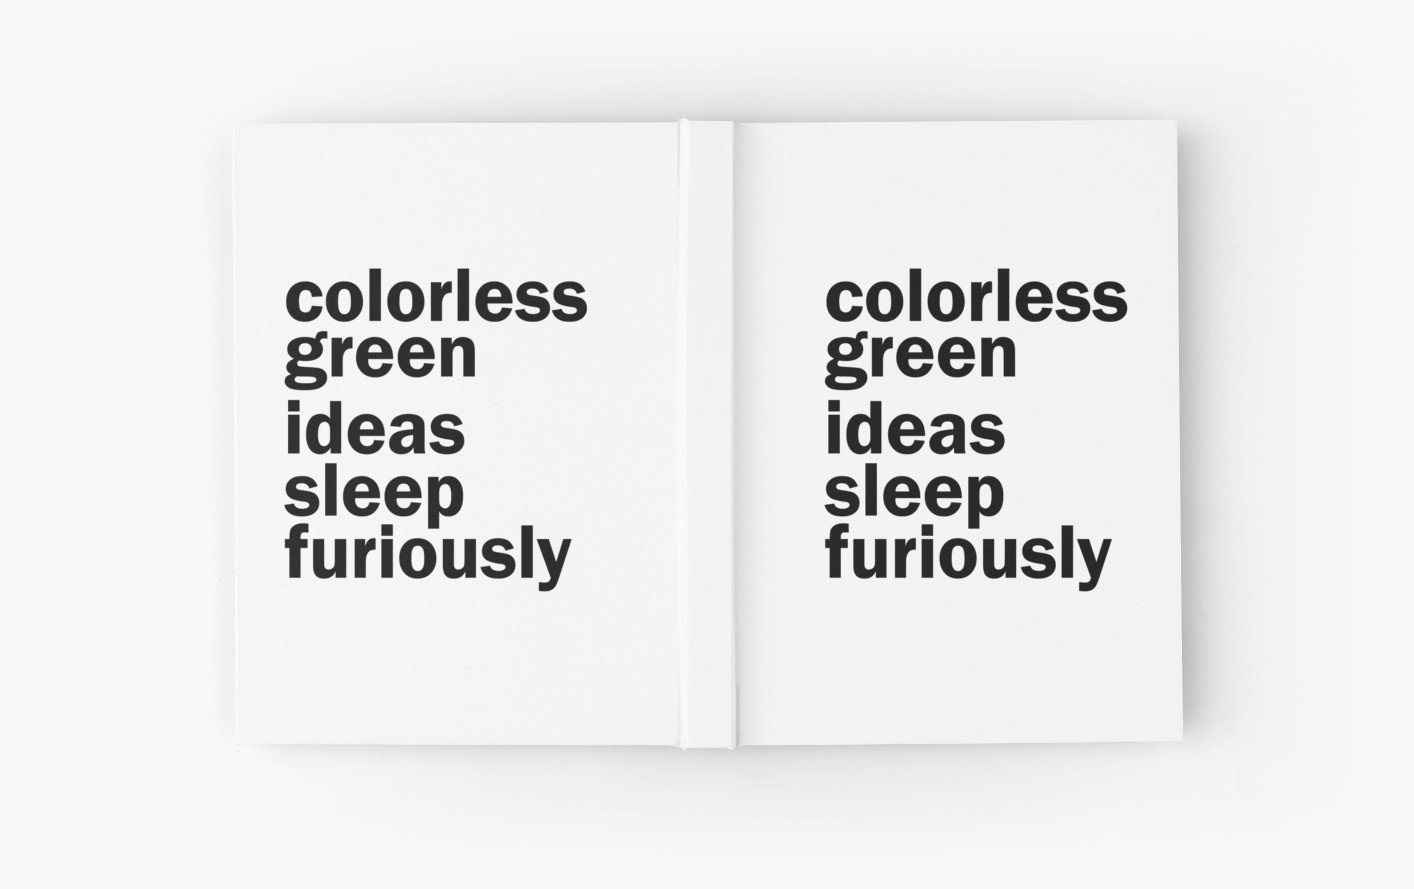 10 Gorgeous Colorless Green Ideas Sleep Furiously colorless green ideas sleep furiously white linguistics 1 2021